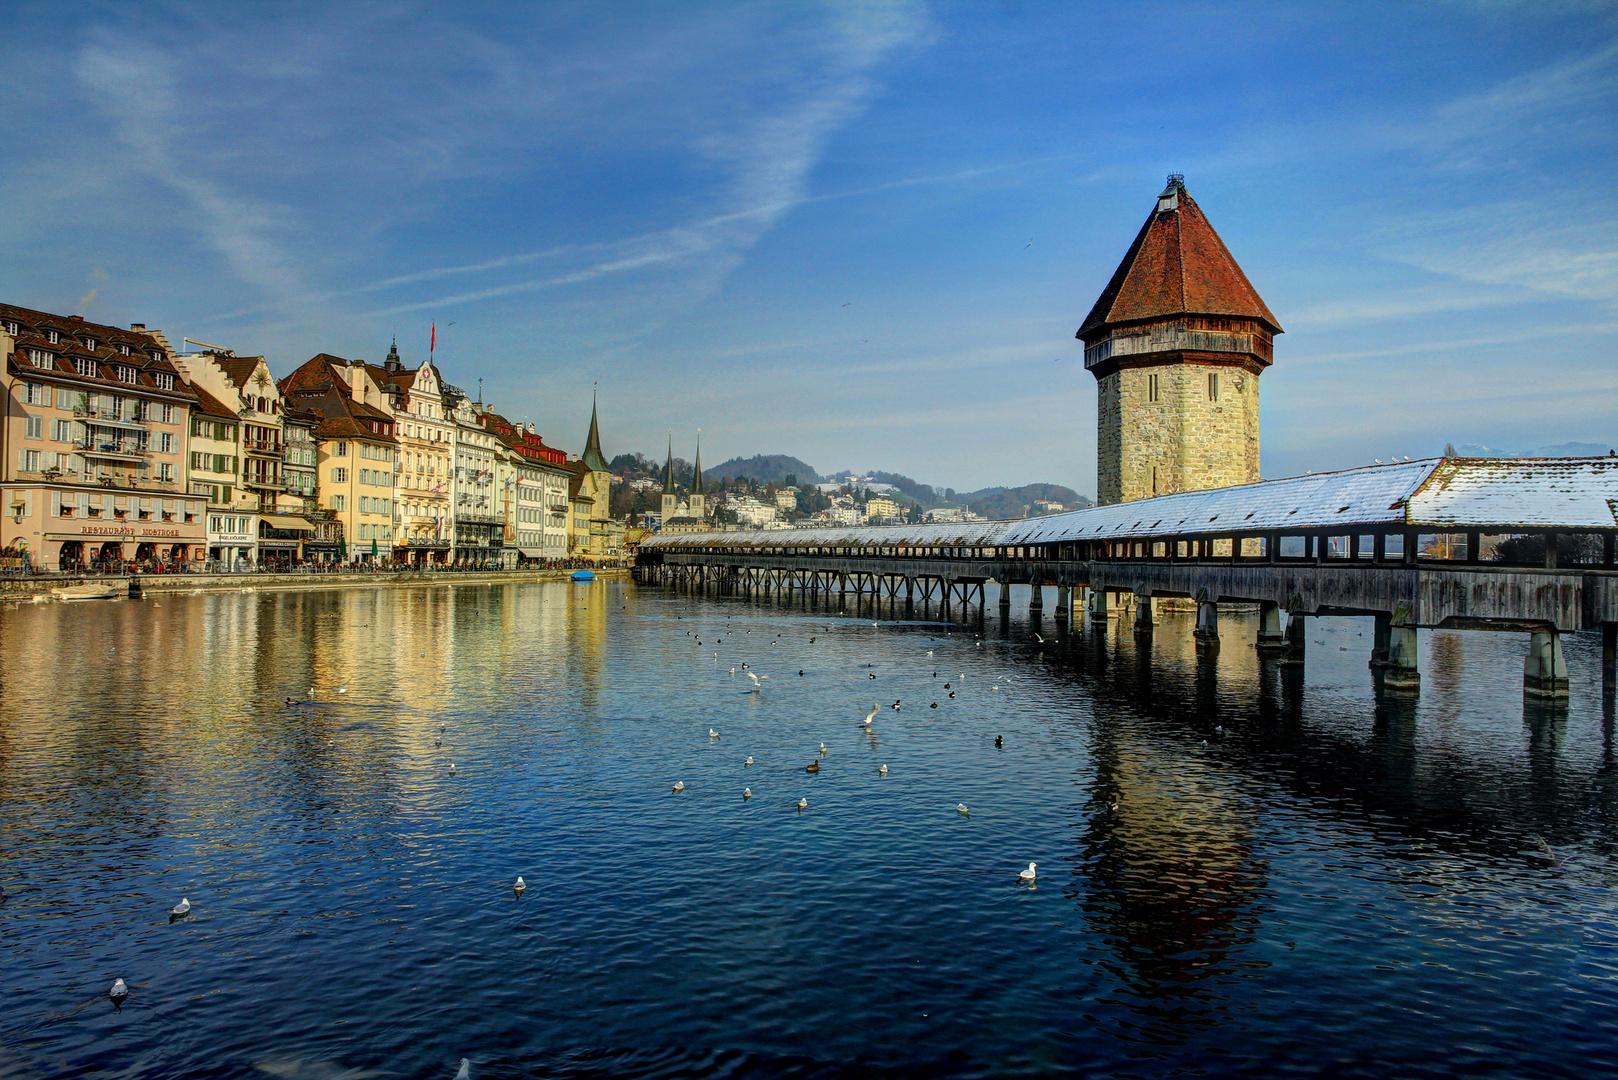 Kapellbrücke im Winter (HDR)